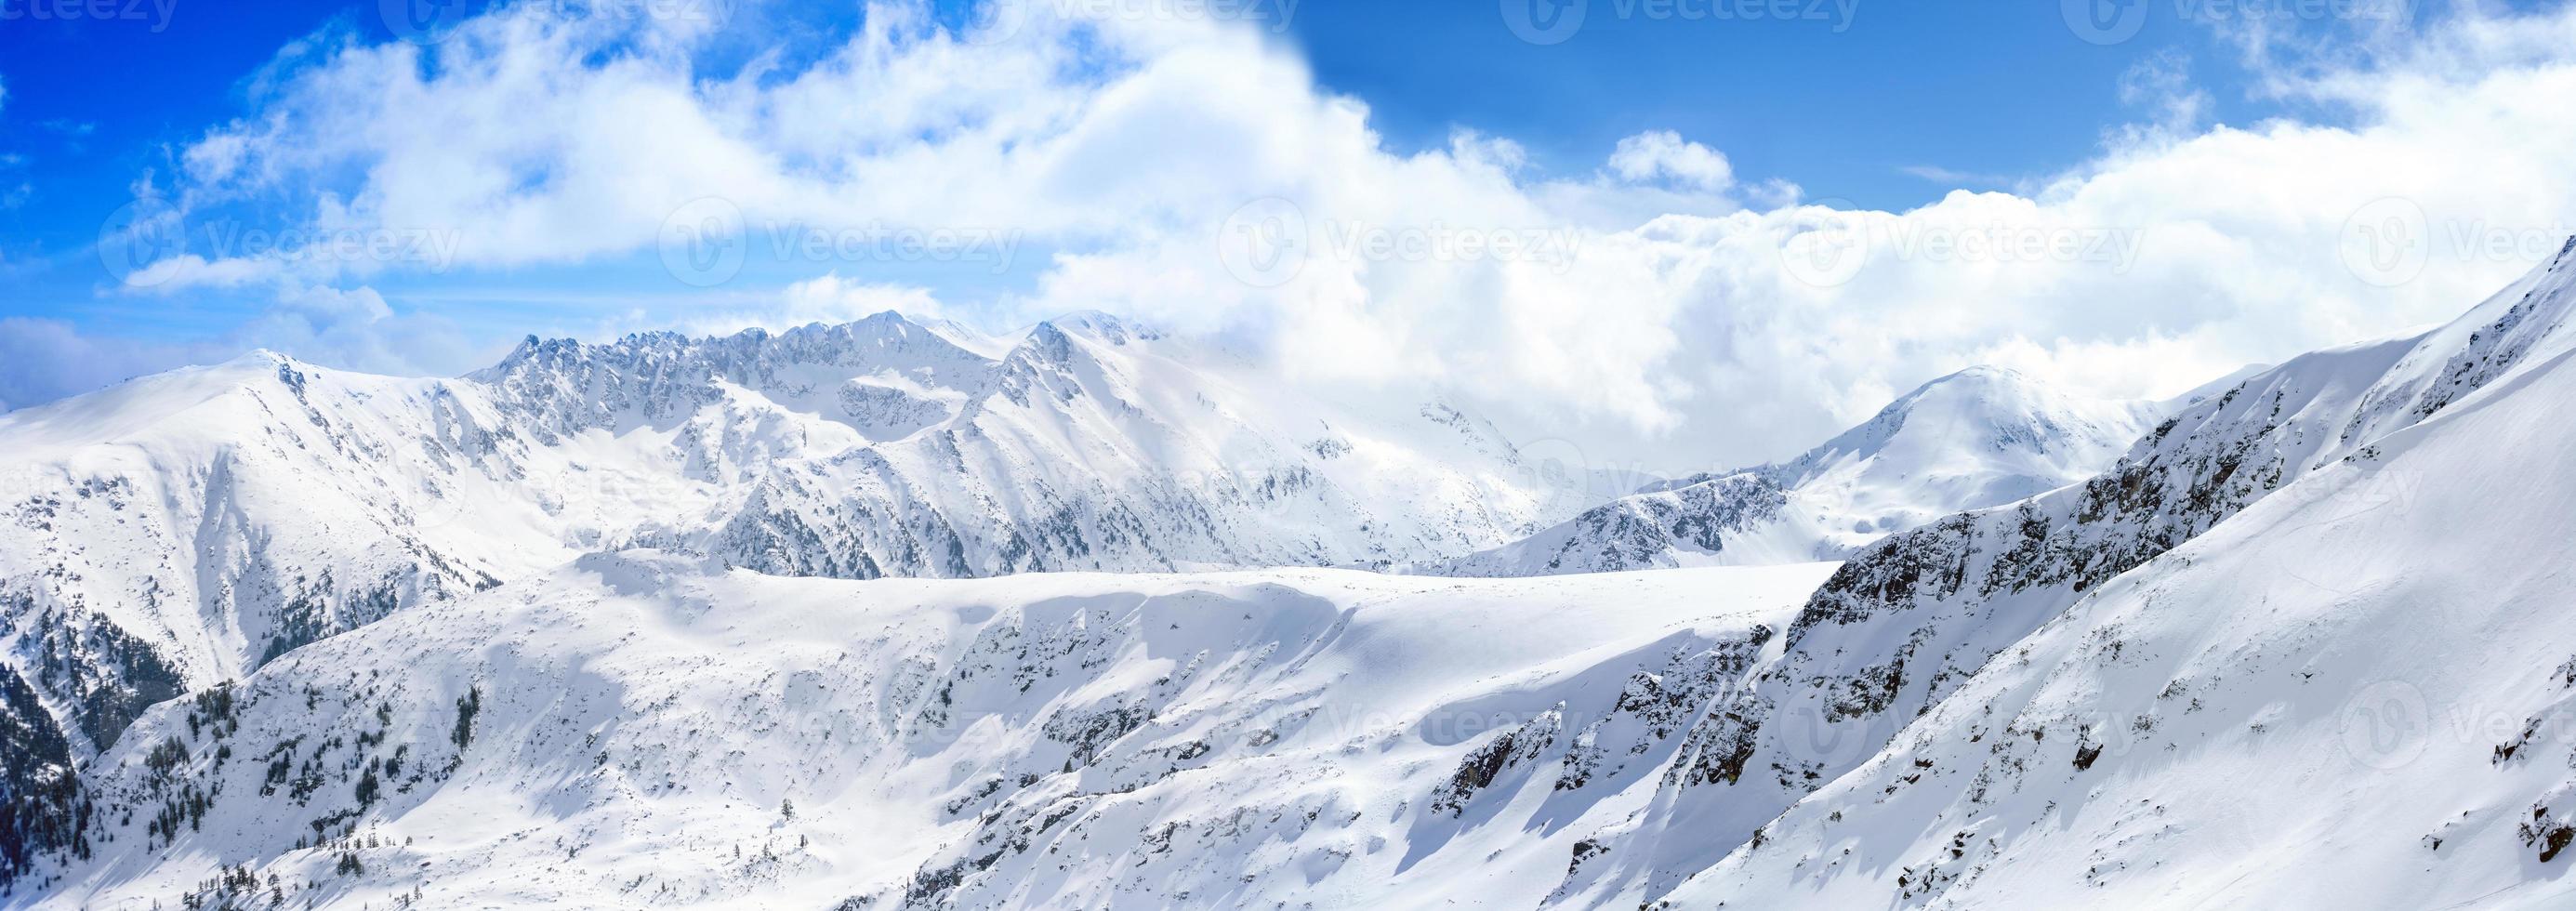 Winterwunderland im Berg foto